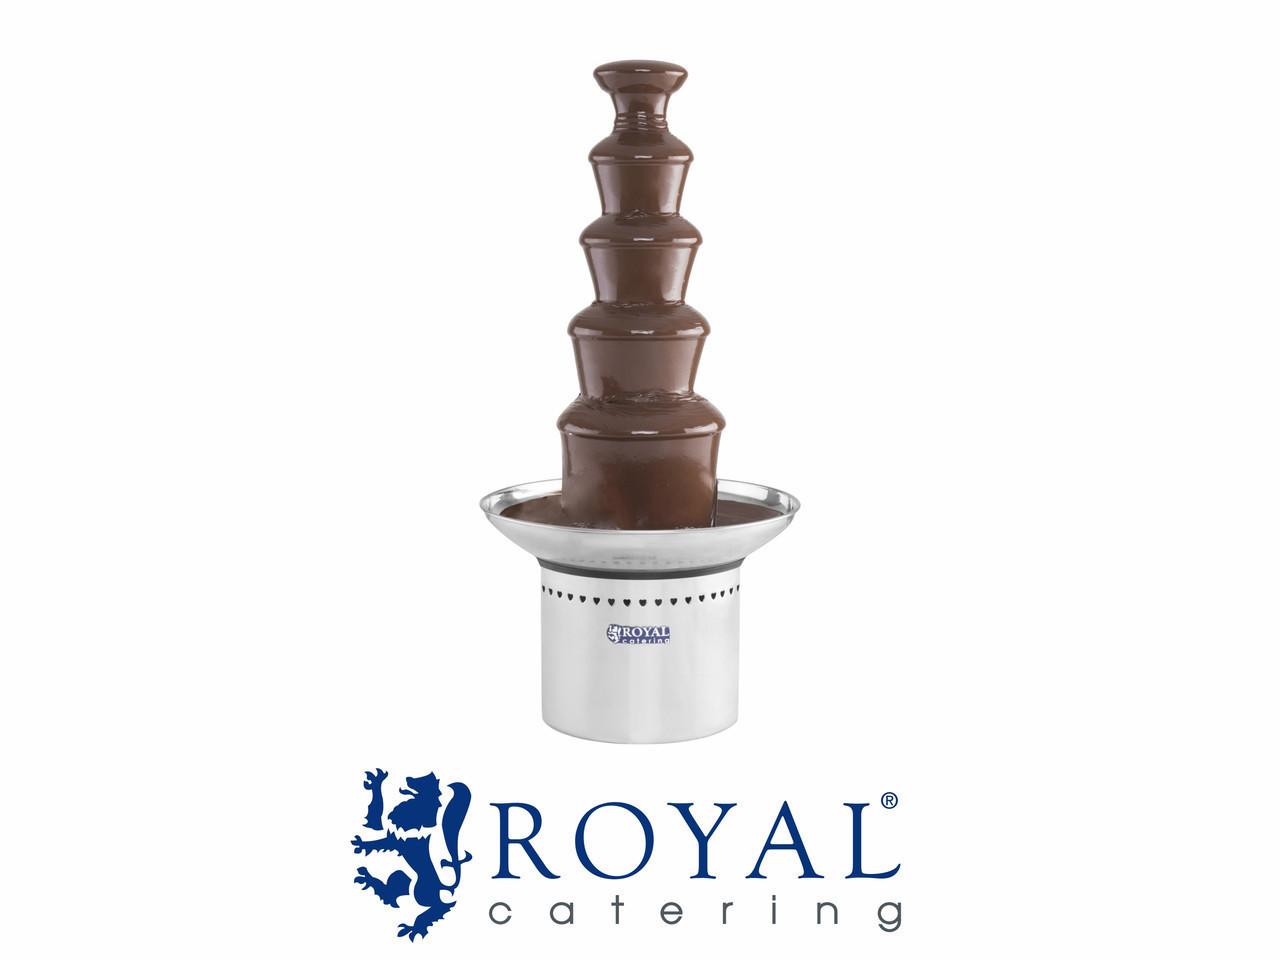 Шоколадний фонтан ROYAL